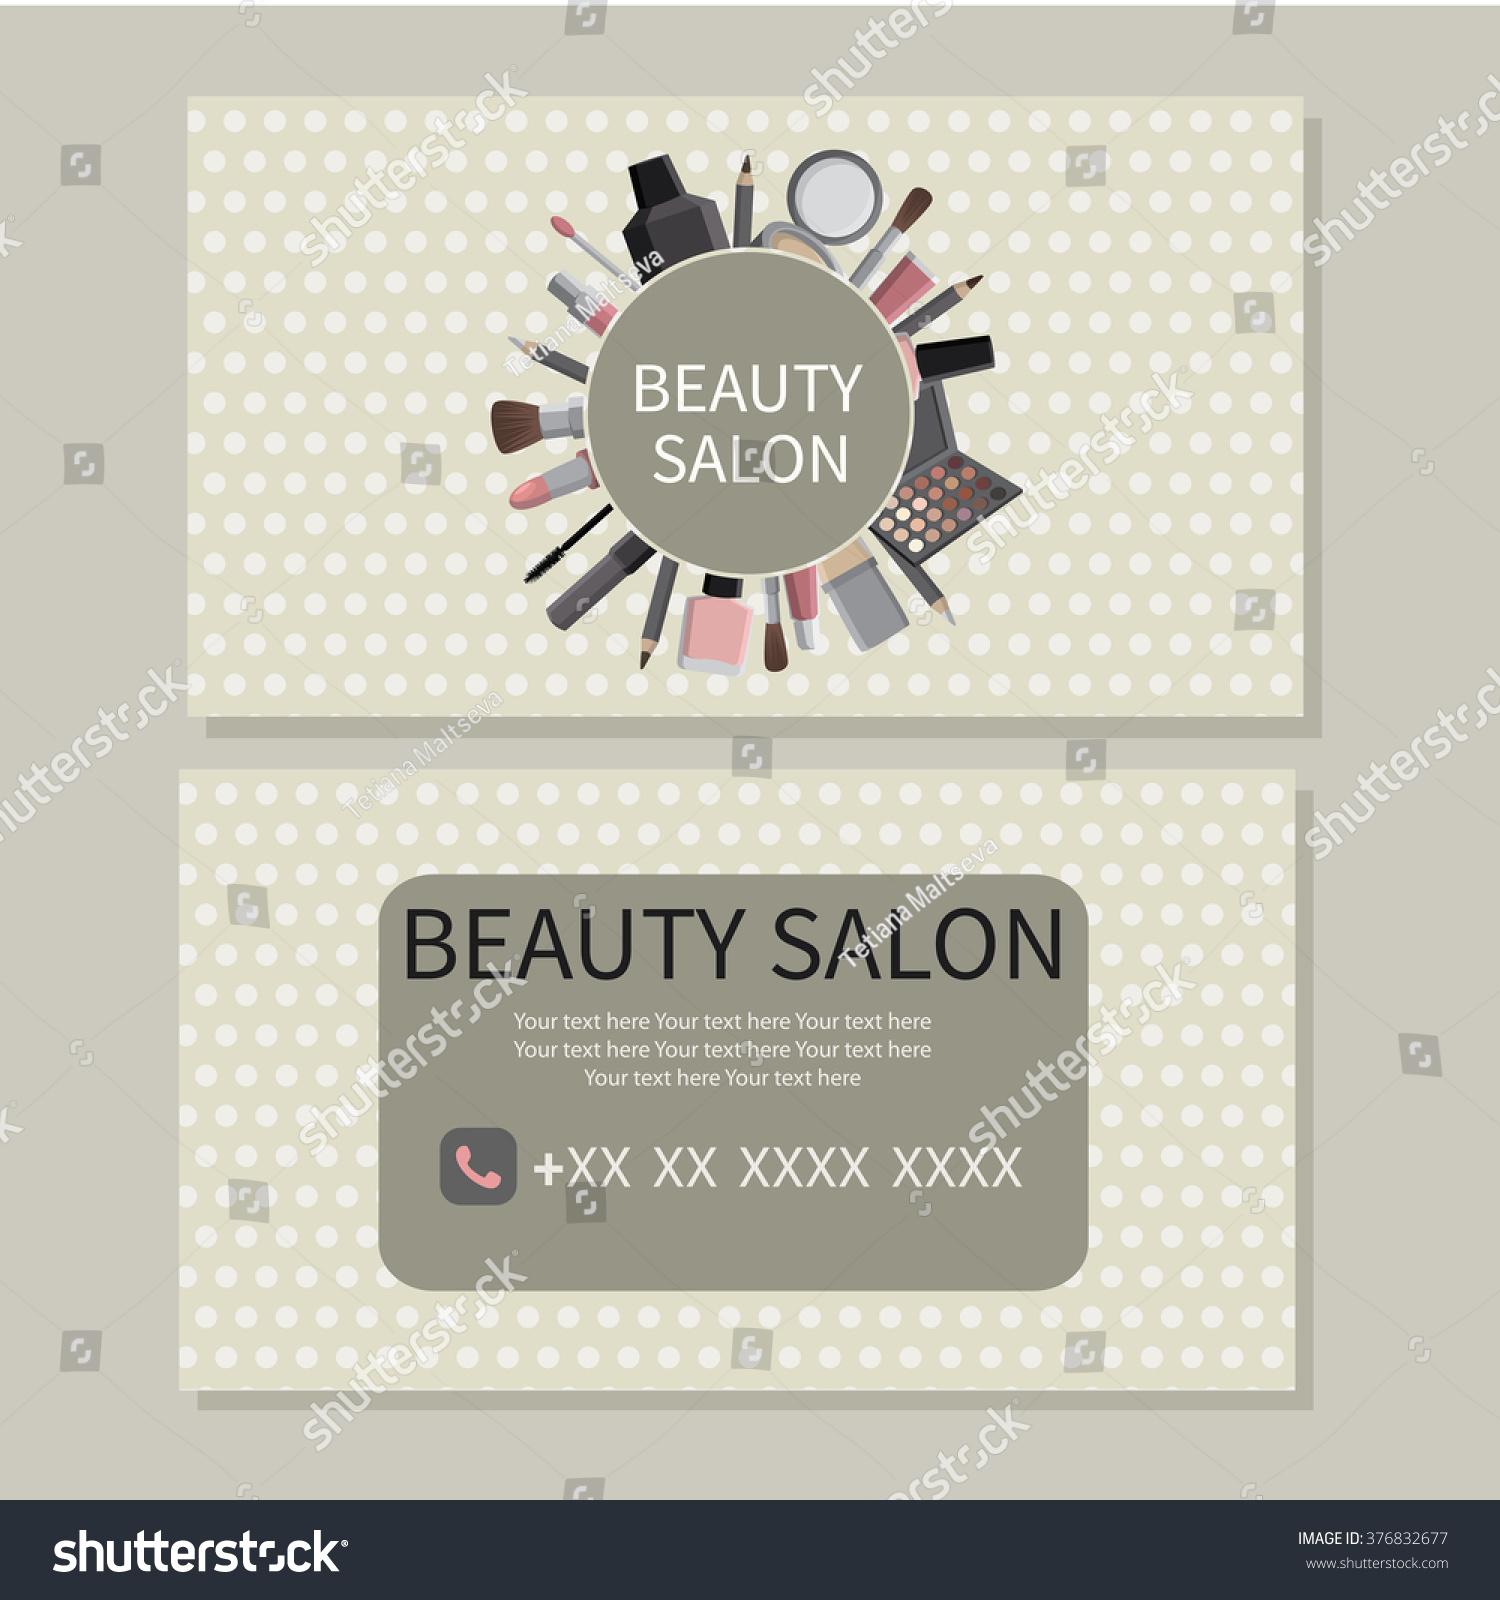 Beauty salon beauty makeup care cute stock vector for A trial beauty treatment salon